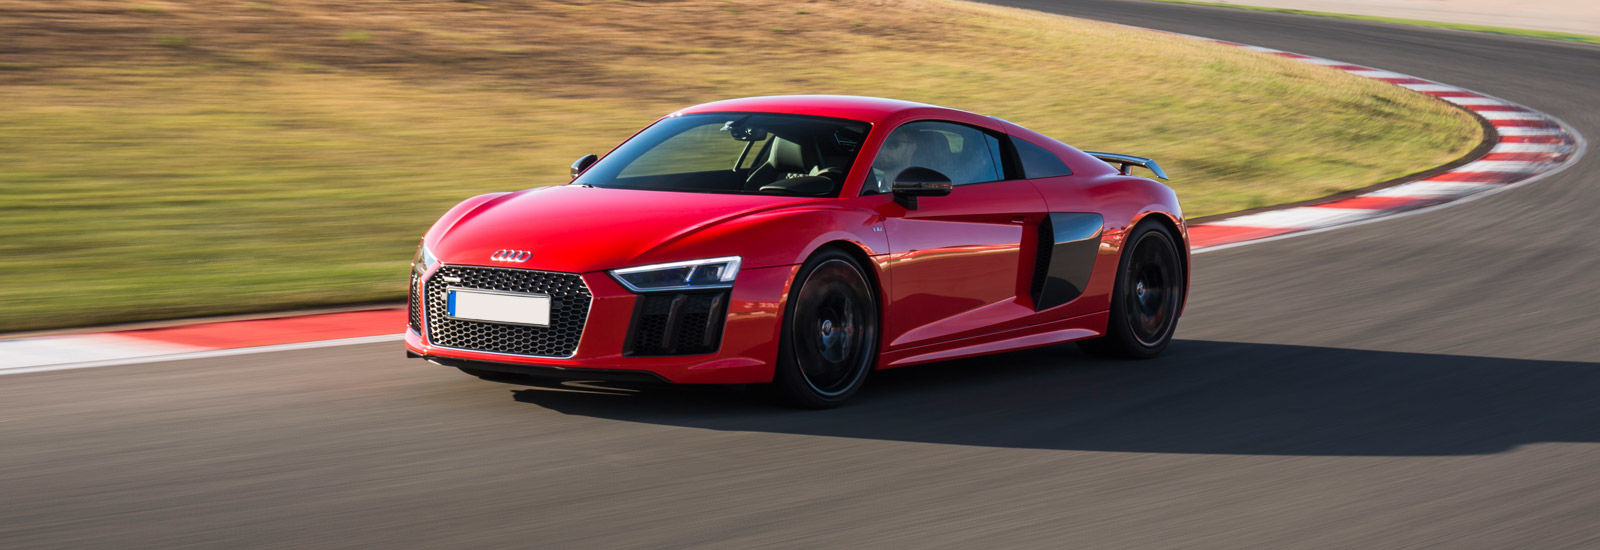 Audis Quattro Allwheel Drive System Explained Carwow - Audis